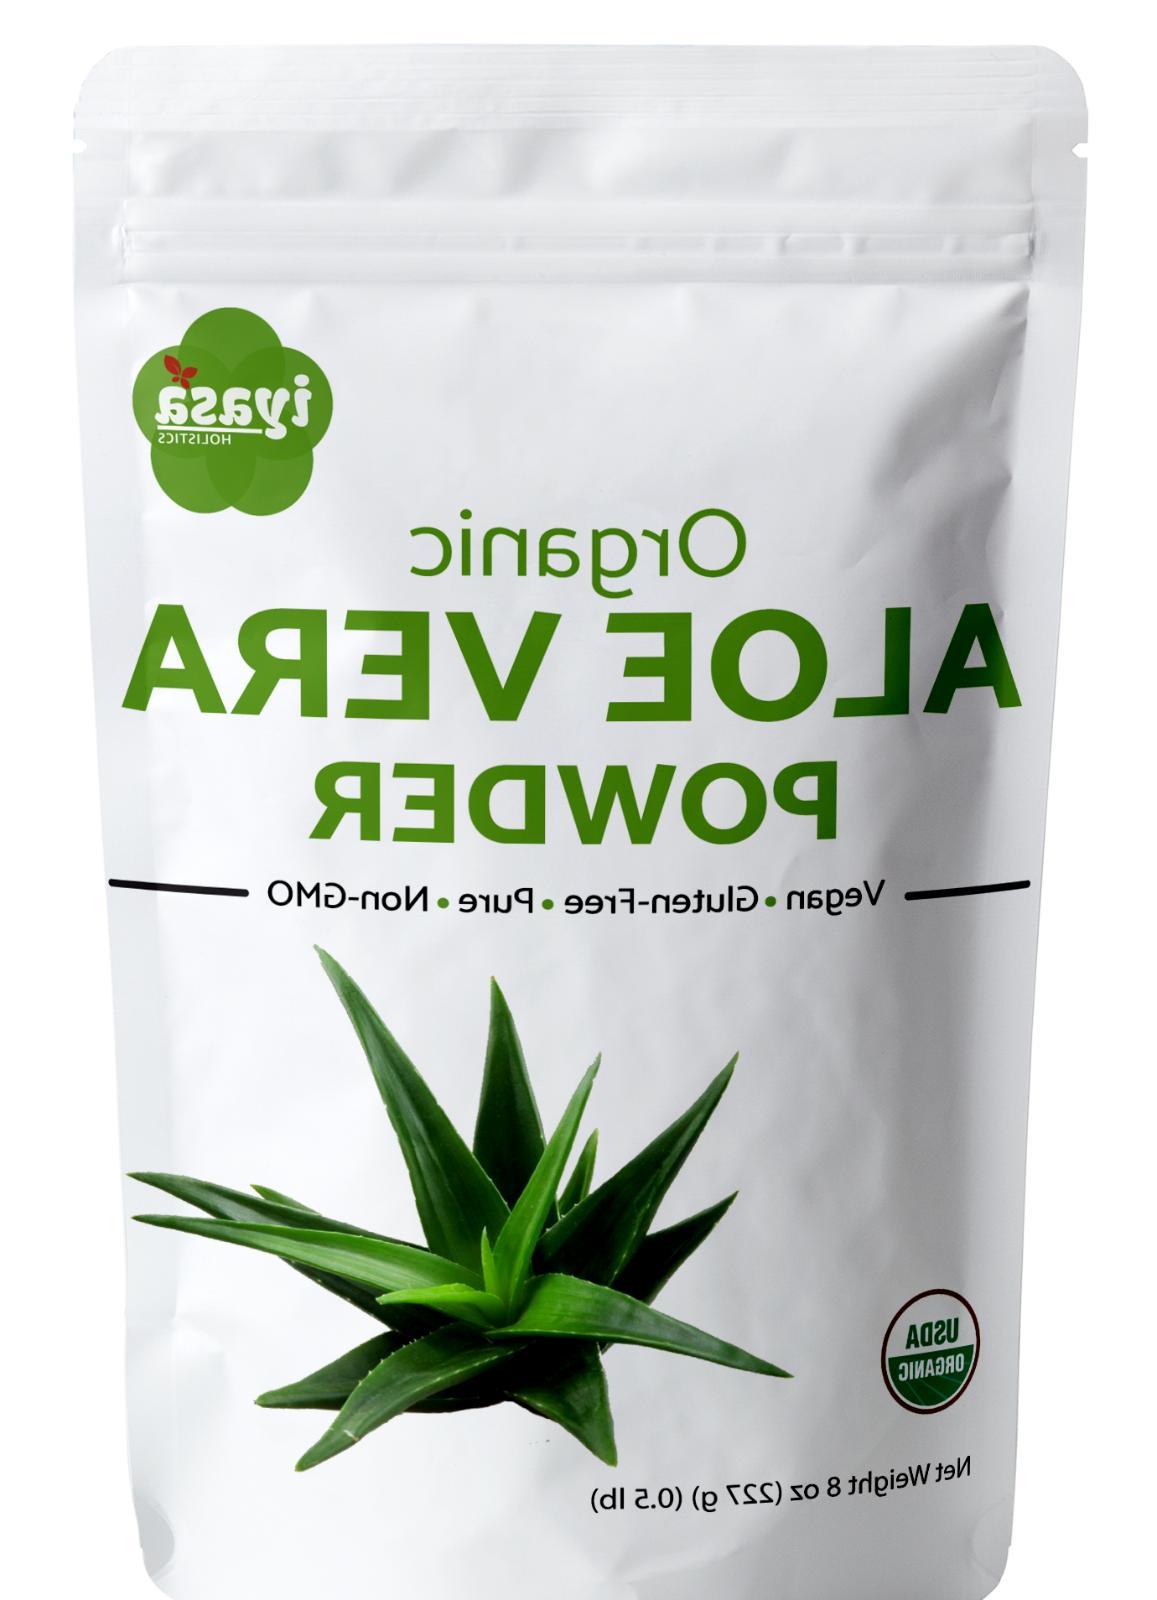 Organic Aloe Vera Powder, Aloe Barbadensis 4,8,16 oz,1 lb,Fa